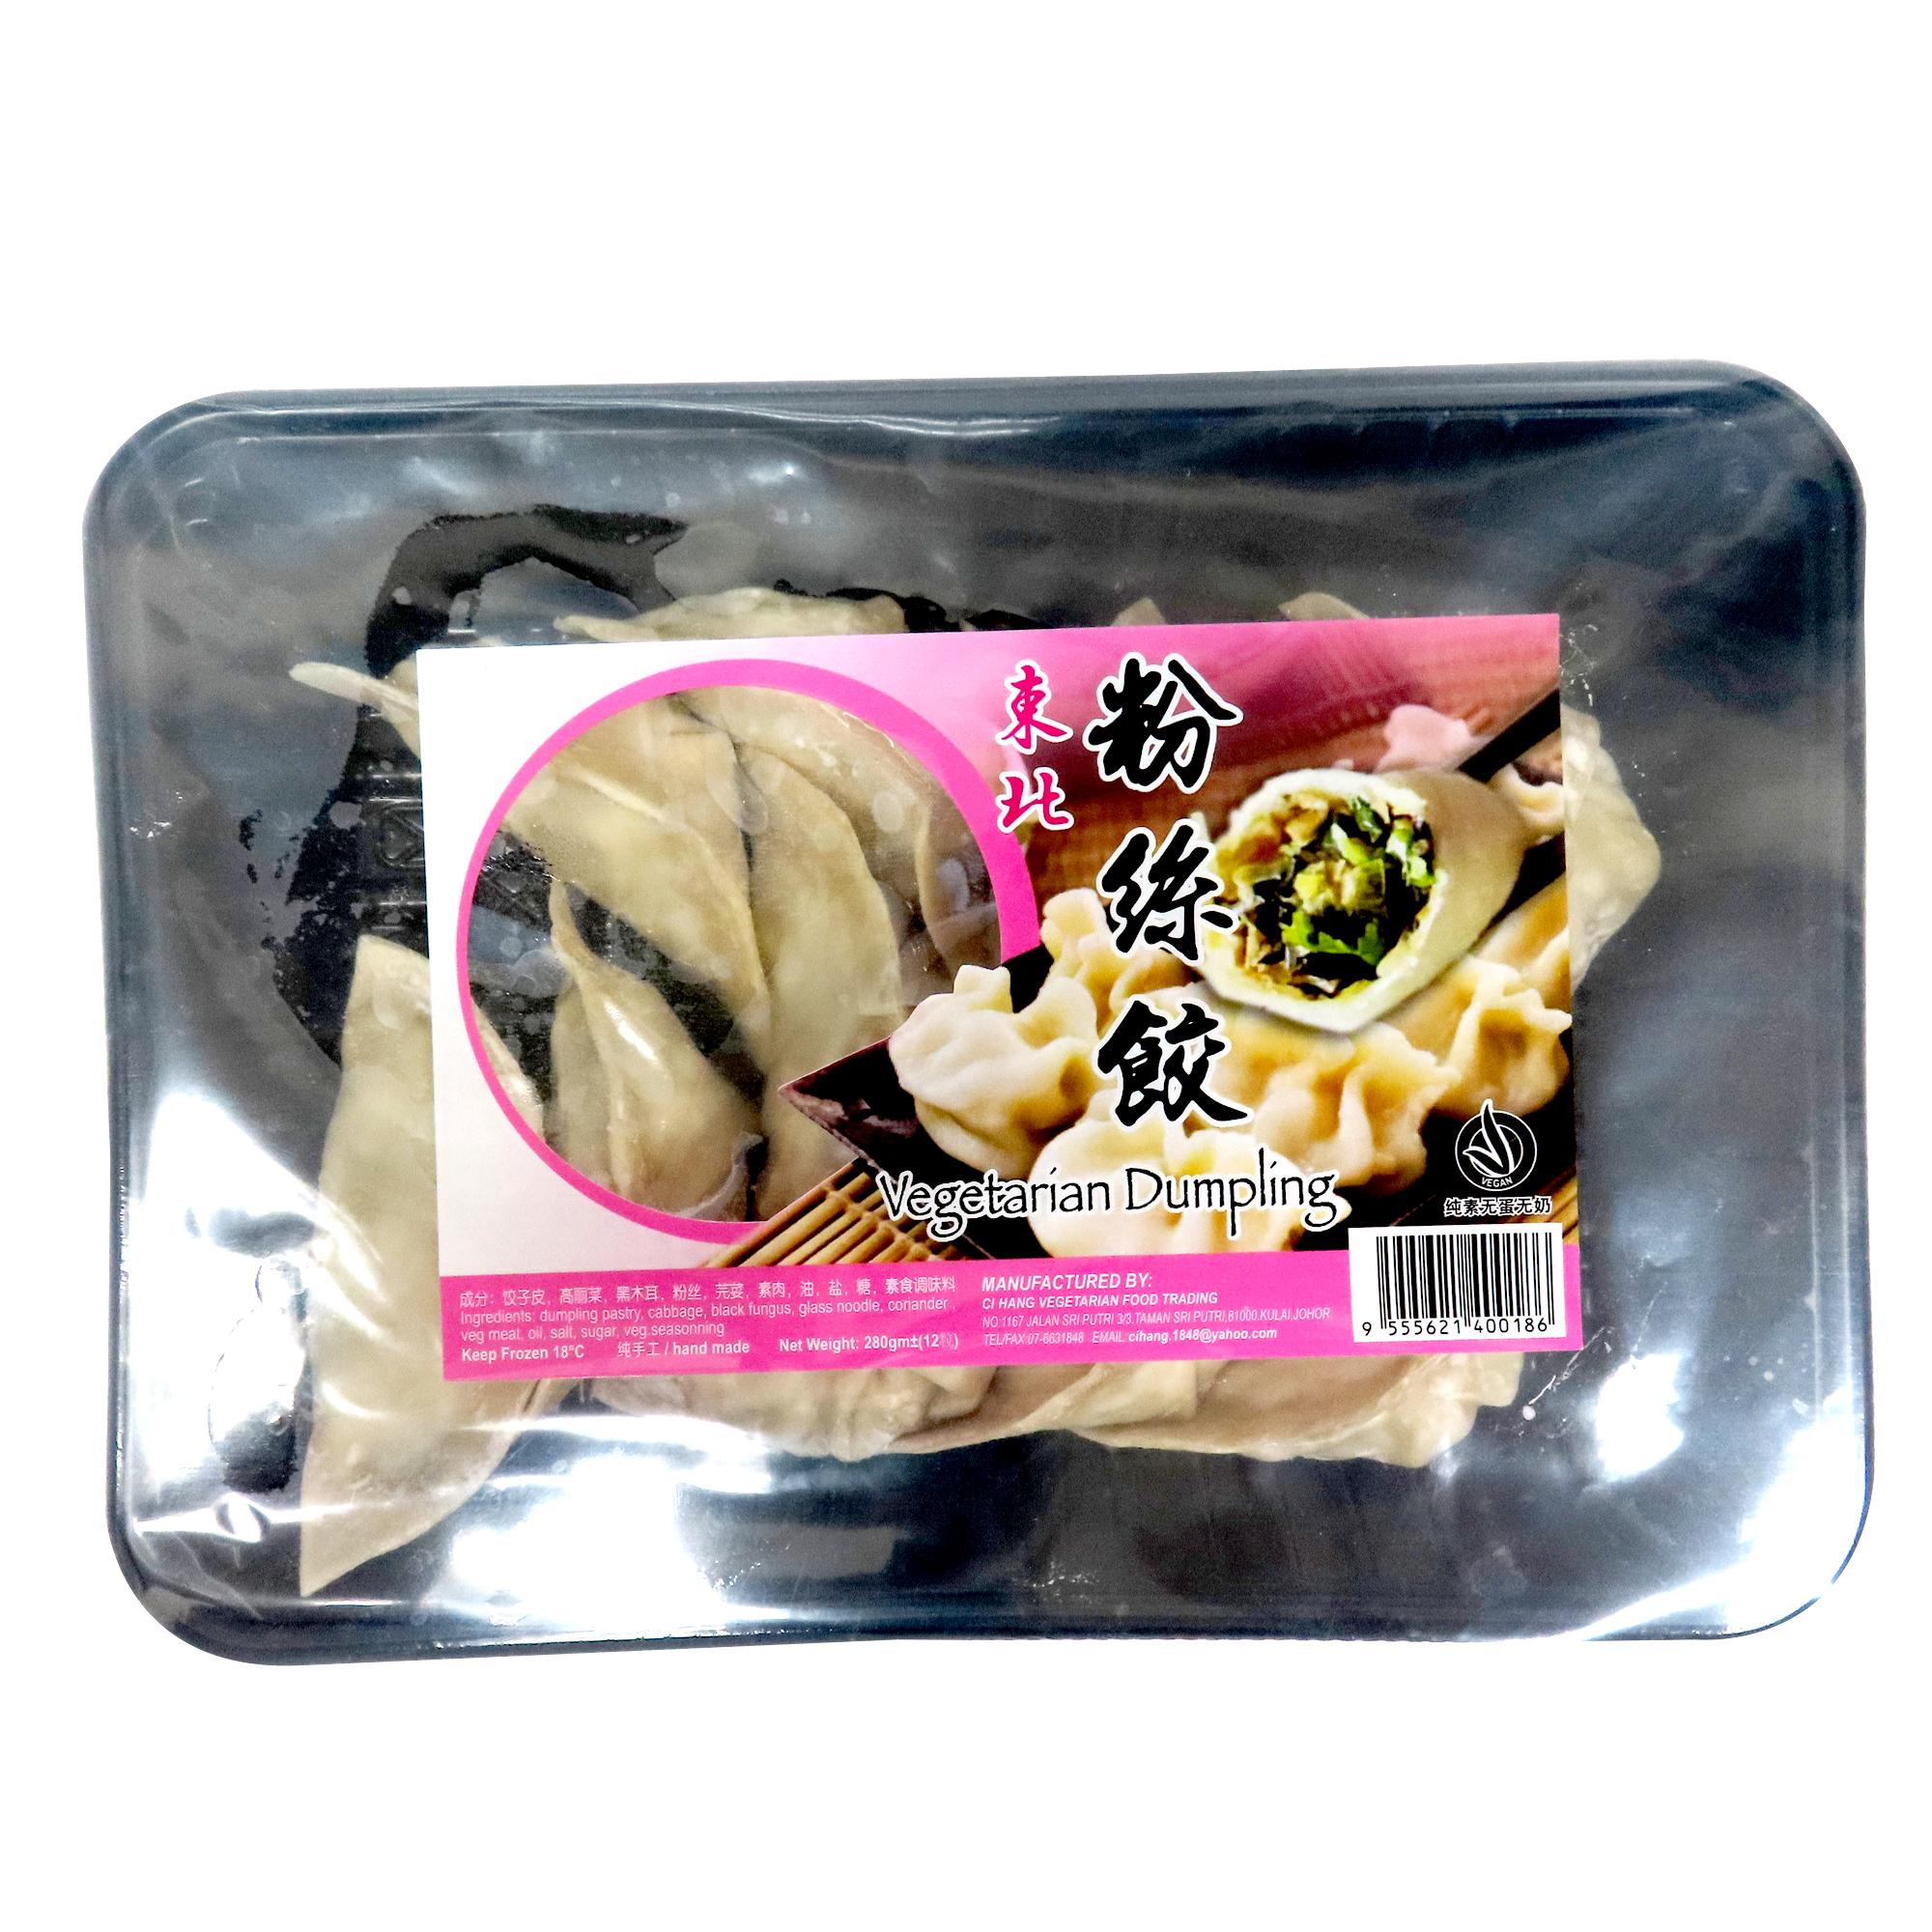 Image CH Vegetarian Dumpling 慈航 - 东北粉丝饺 280grams